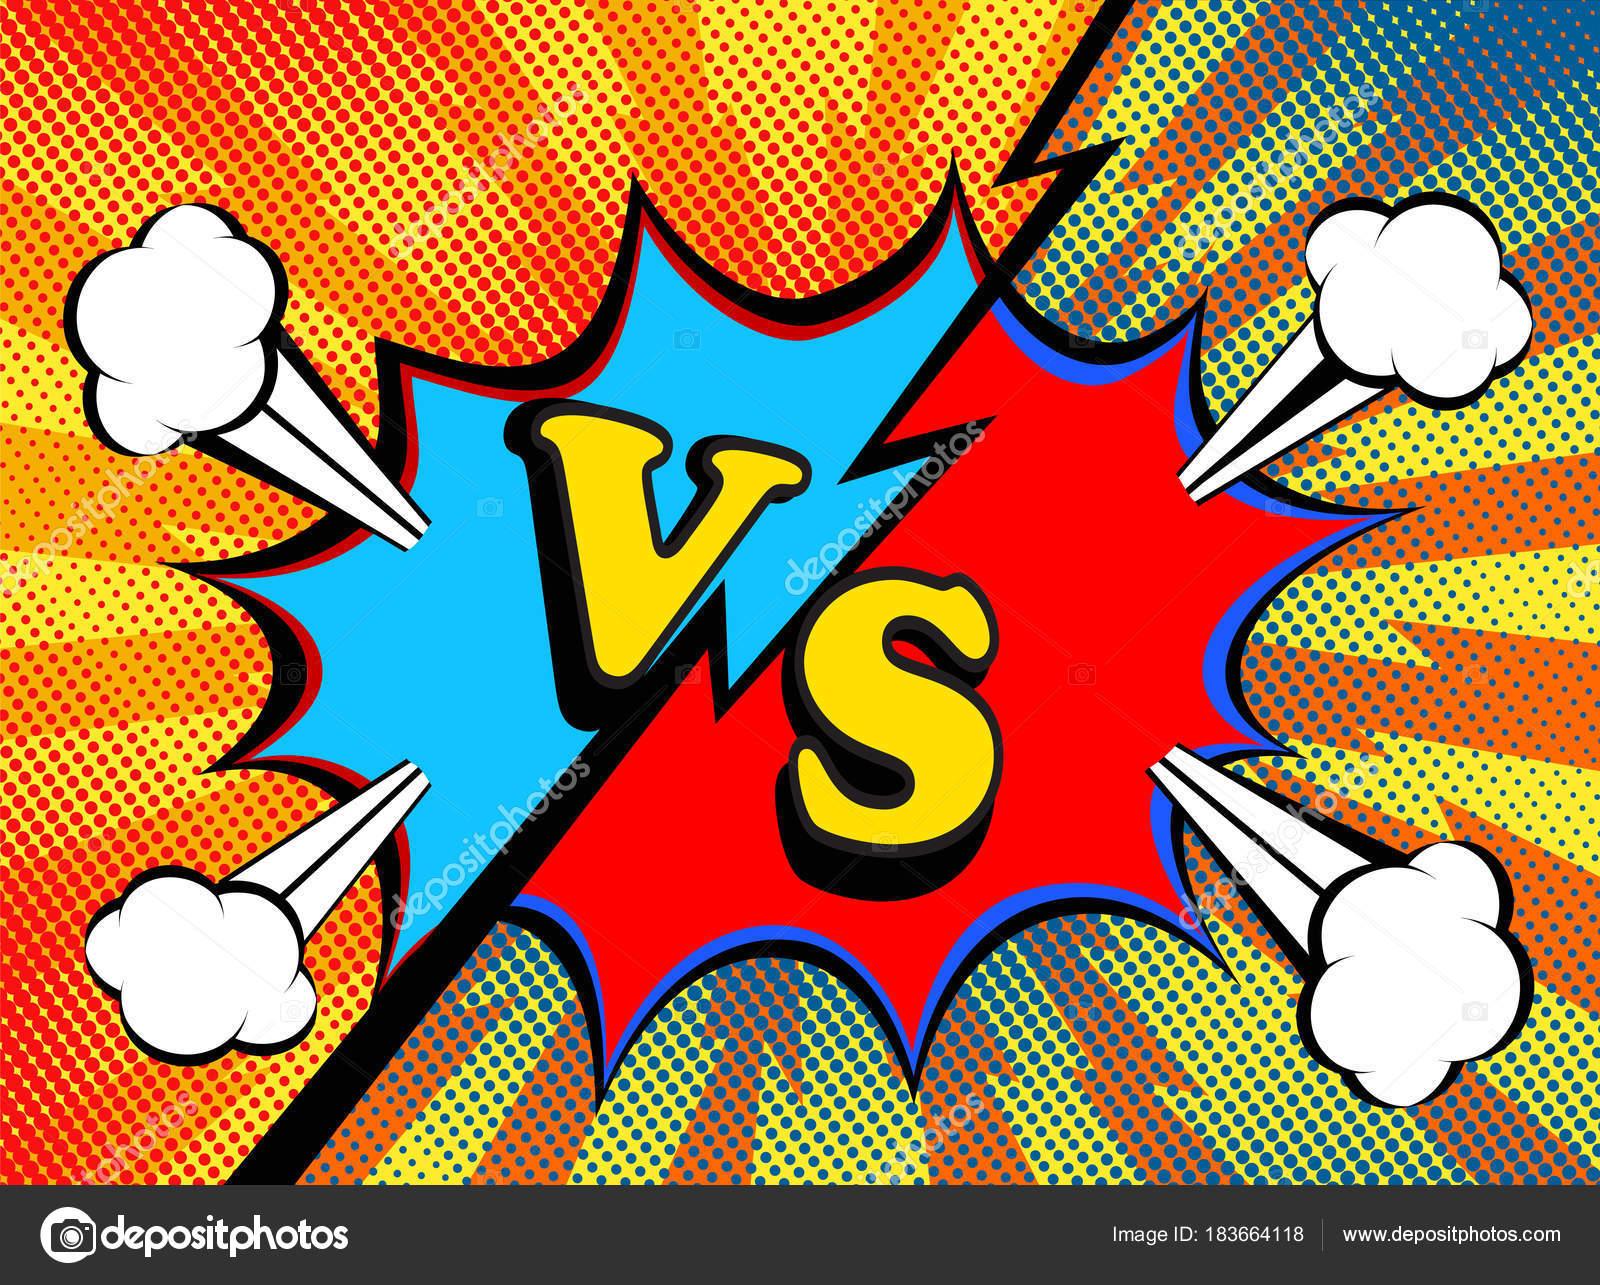 versus vs fight backgrounds pop art retro comic style design stock vector vovanivan. Black Bedroom Furniture Sets. Home Design Ideas